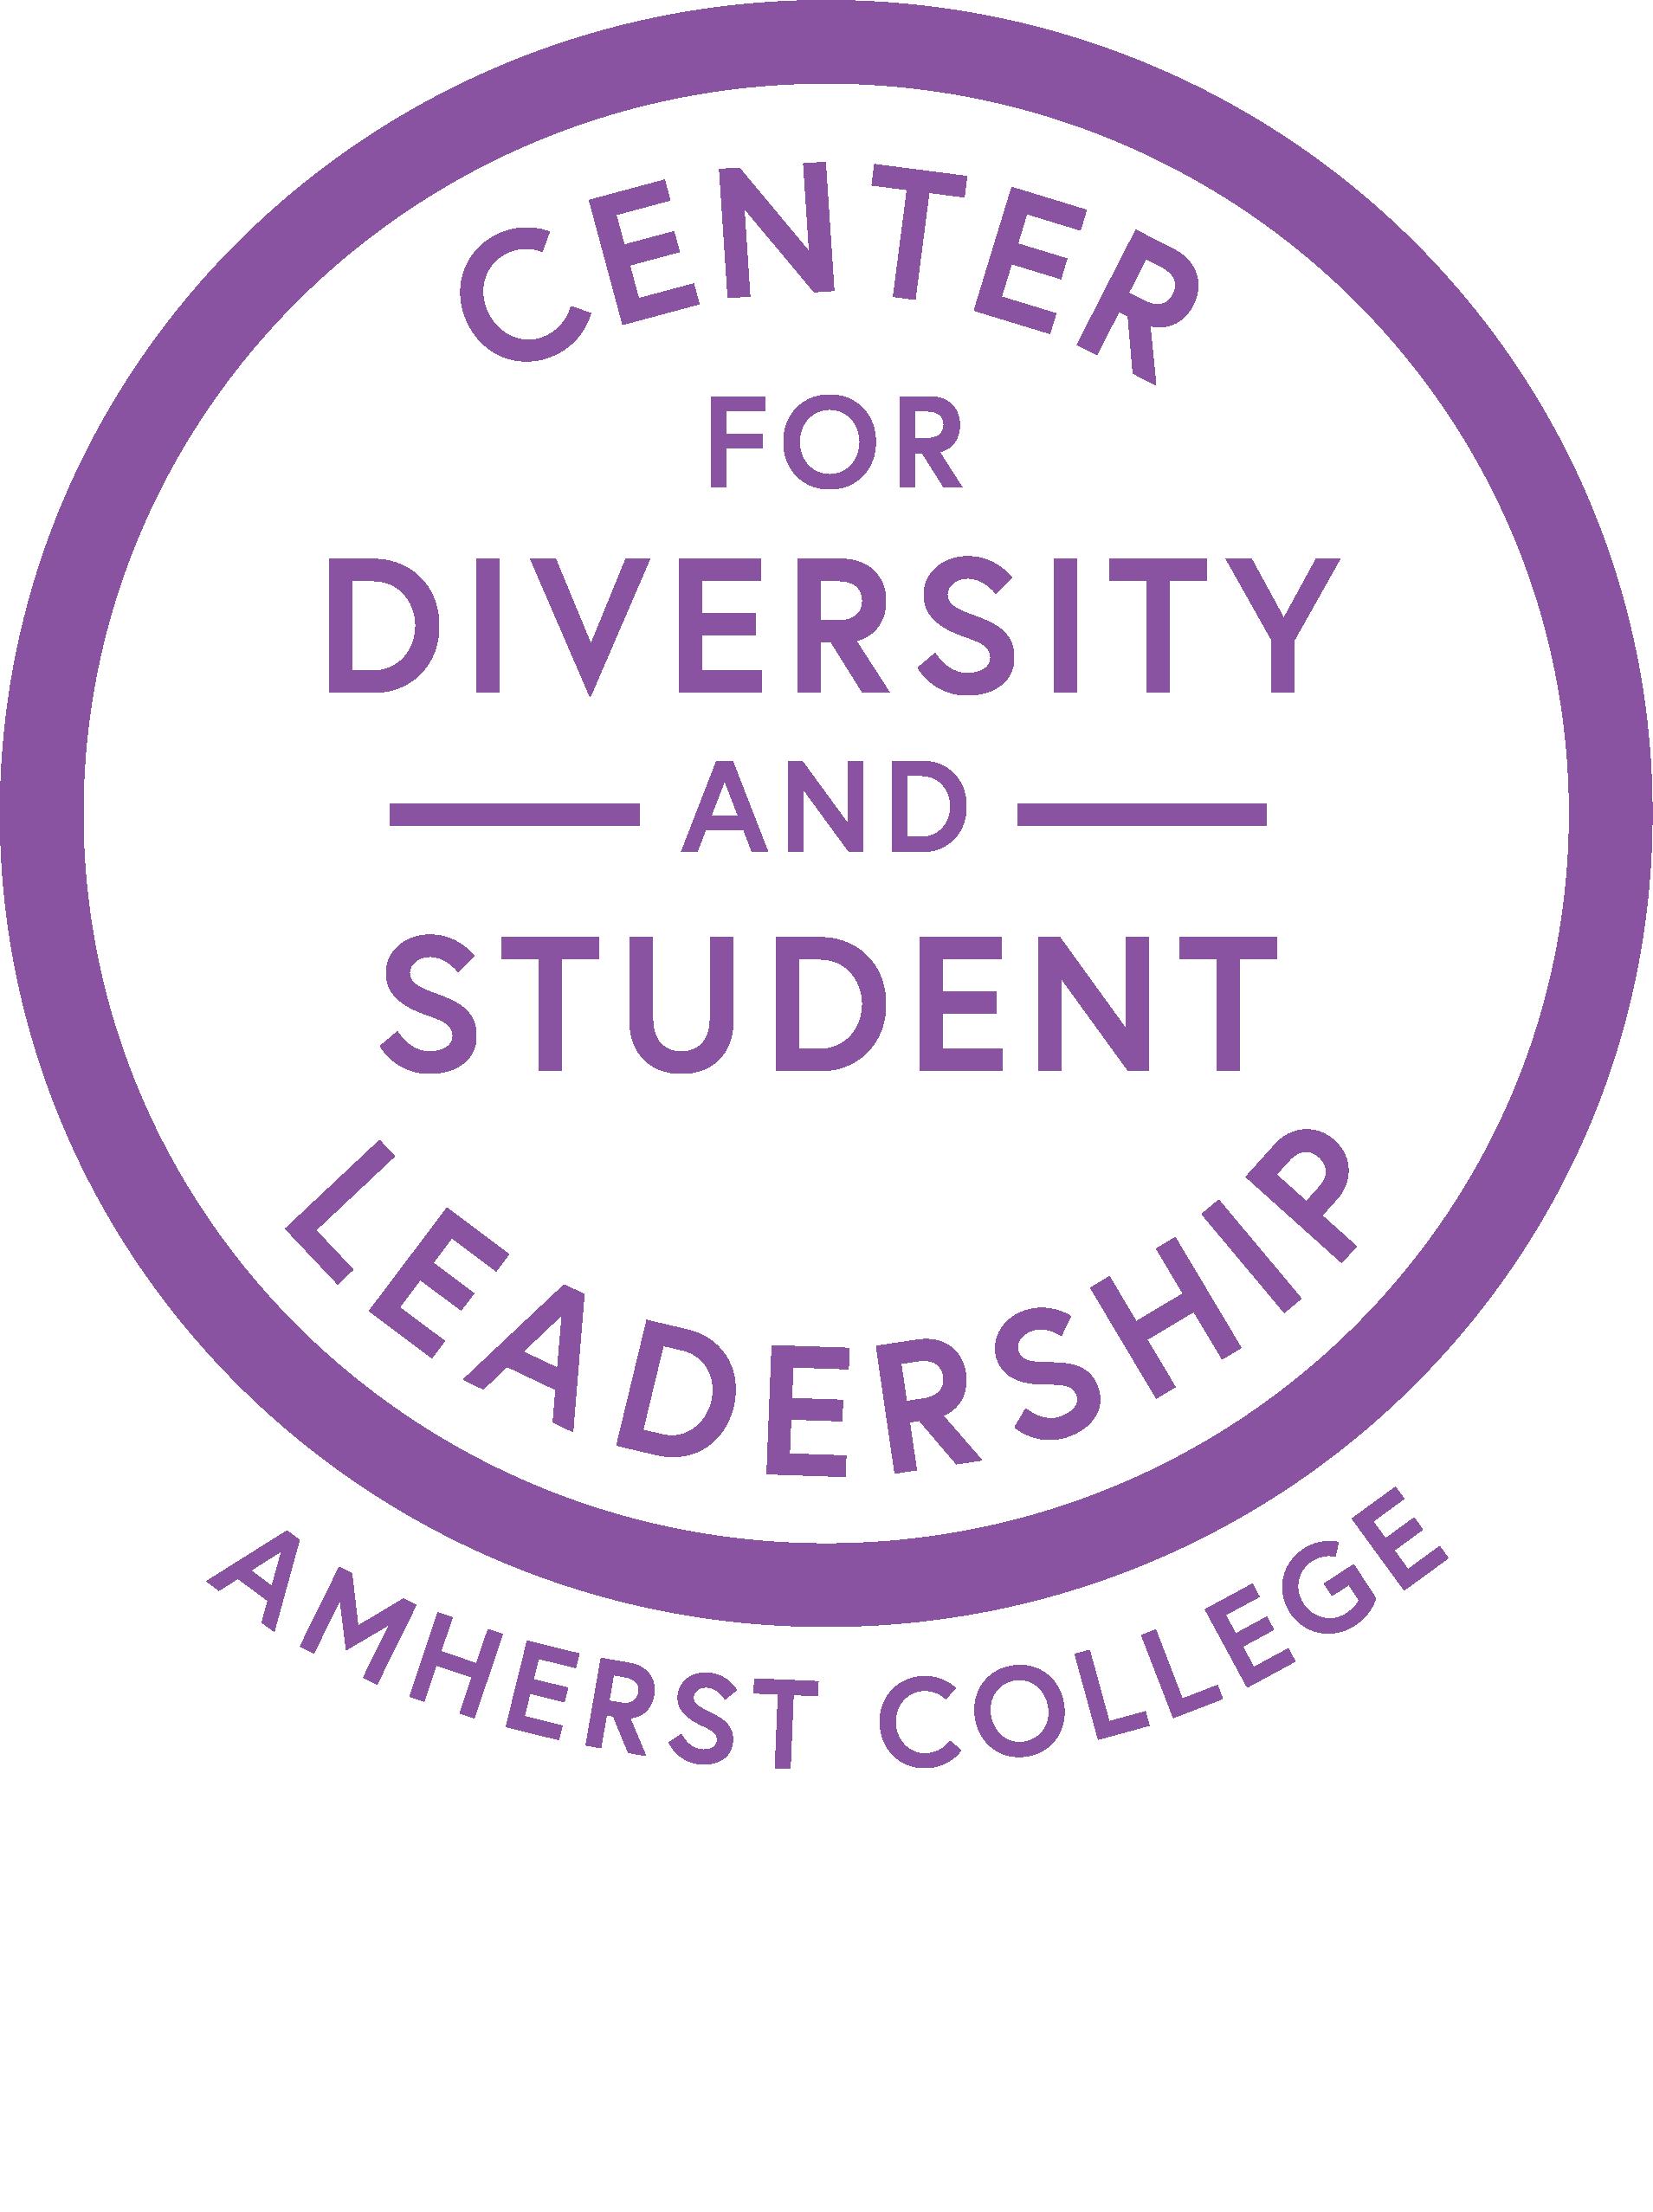 amherst college cdsl logo